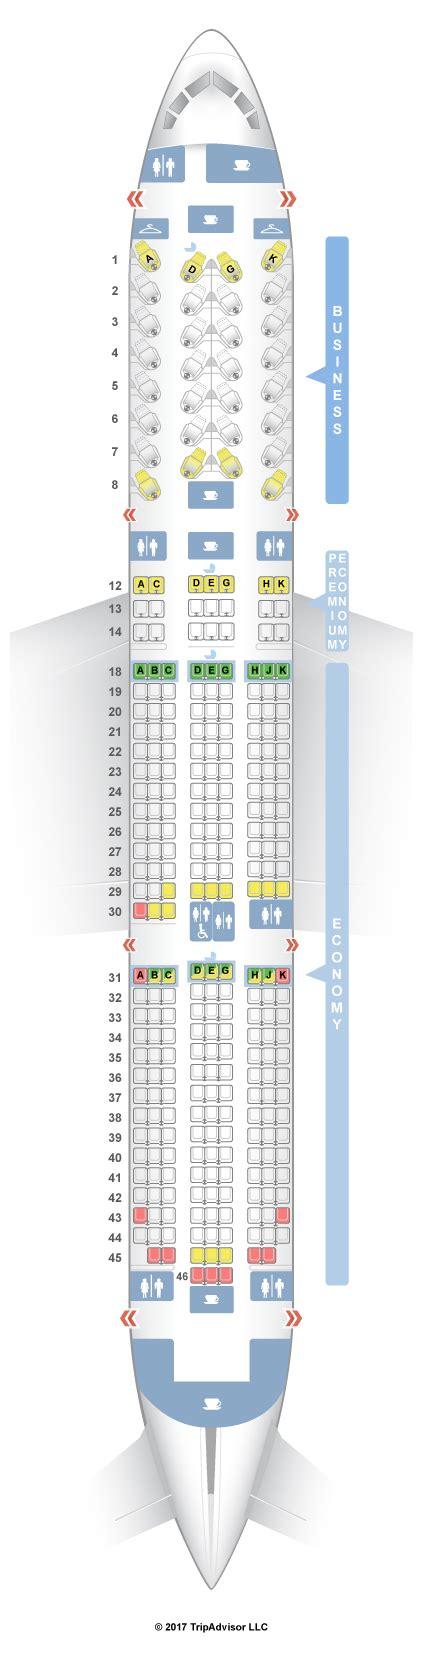 seatguru seat map air canada boeing 787 9 789